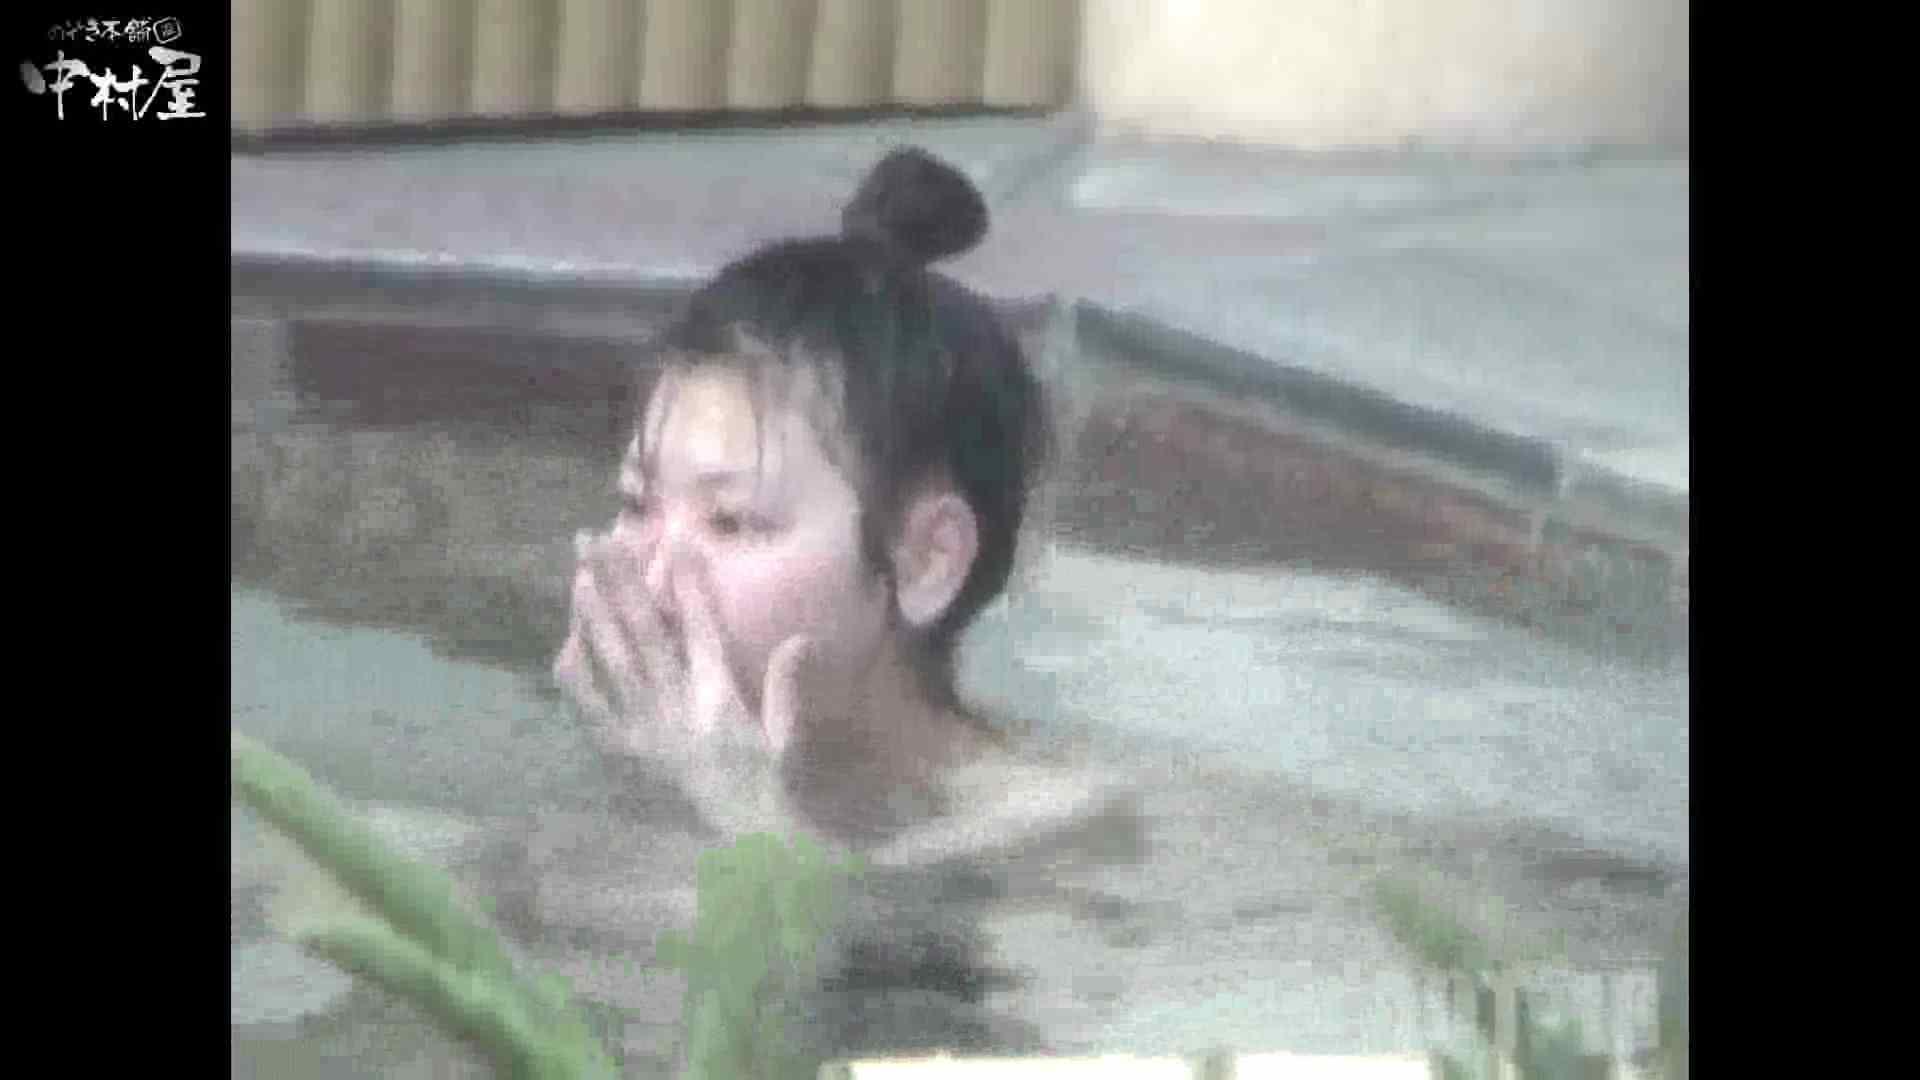 Aquaな露天風呂Vol.882潜入盗撮露天風呂十八判湯 其の二 盗撮 性交動画流出 90画像 38